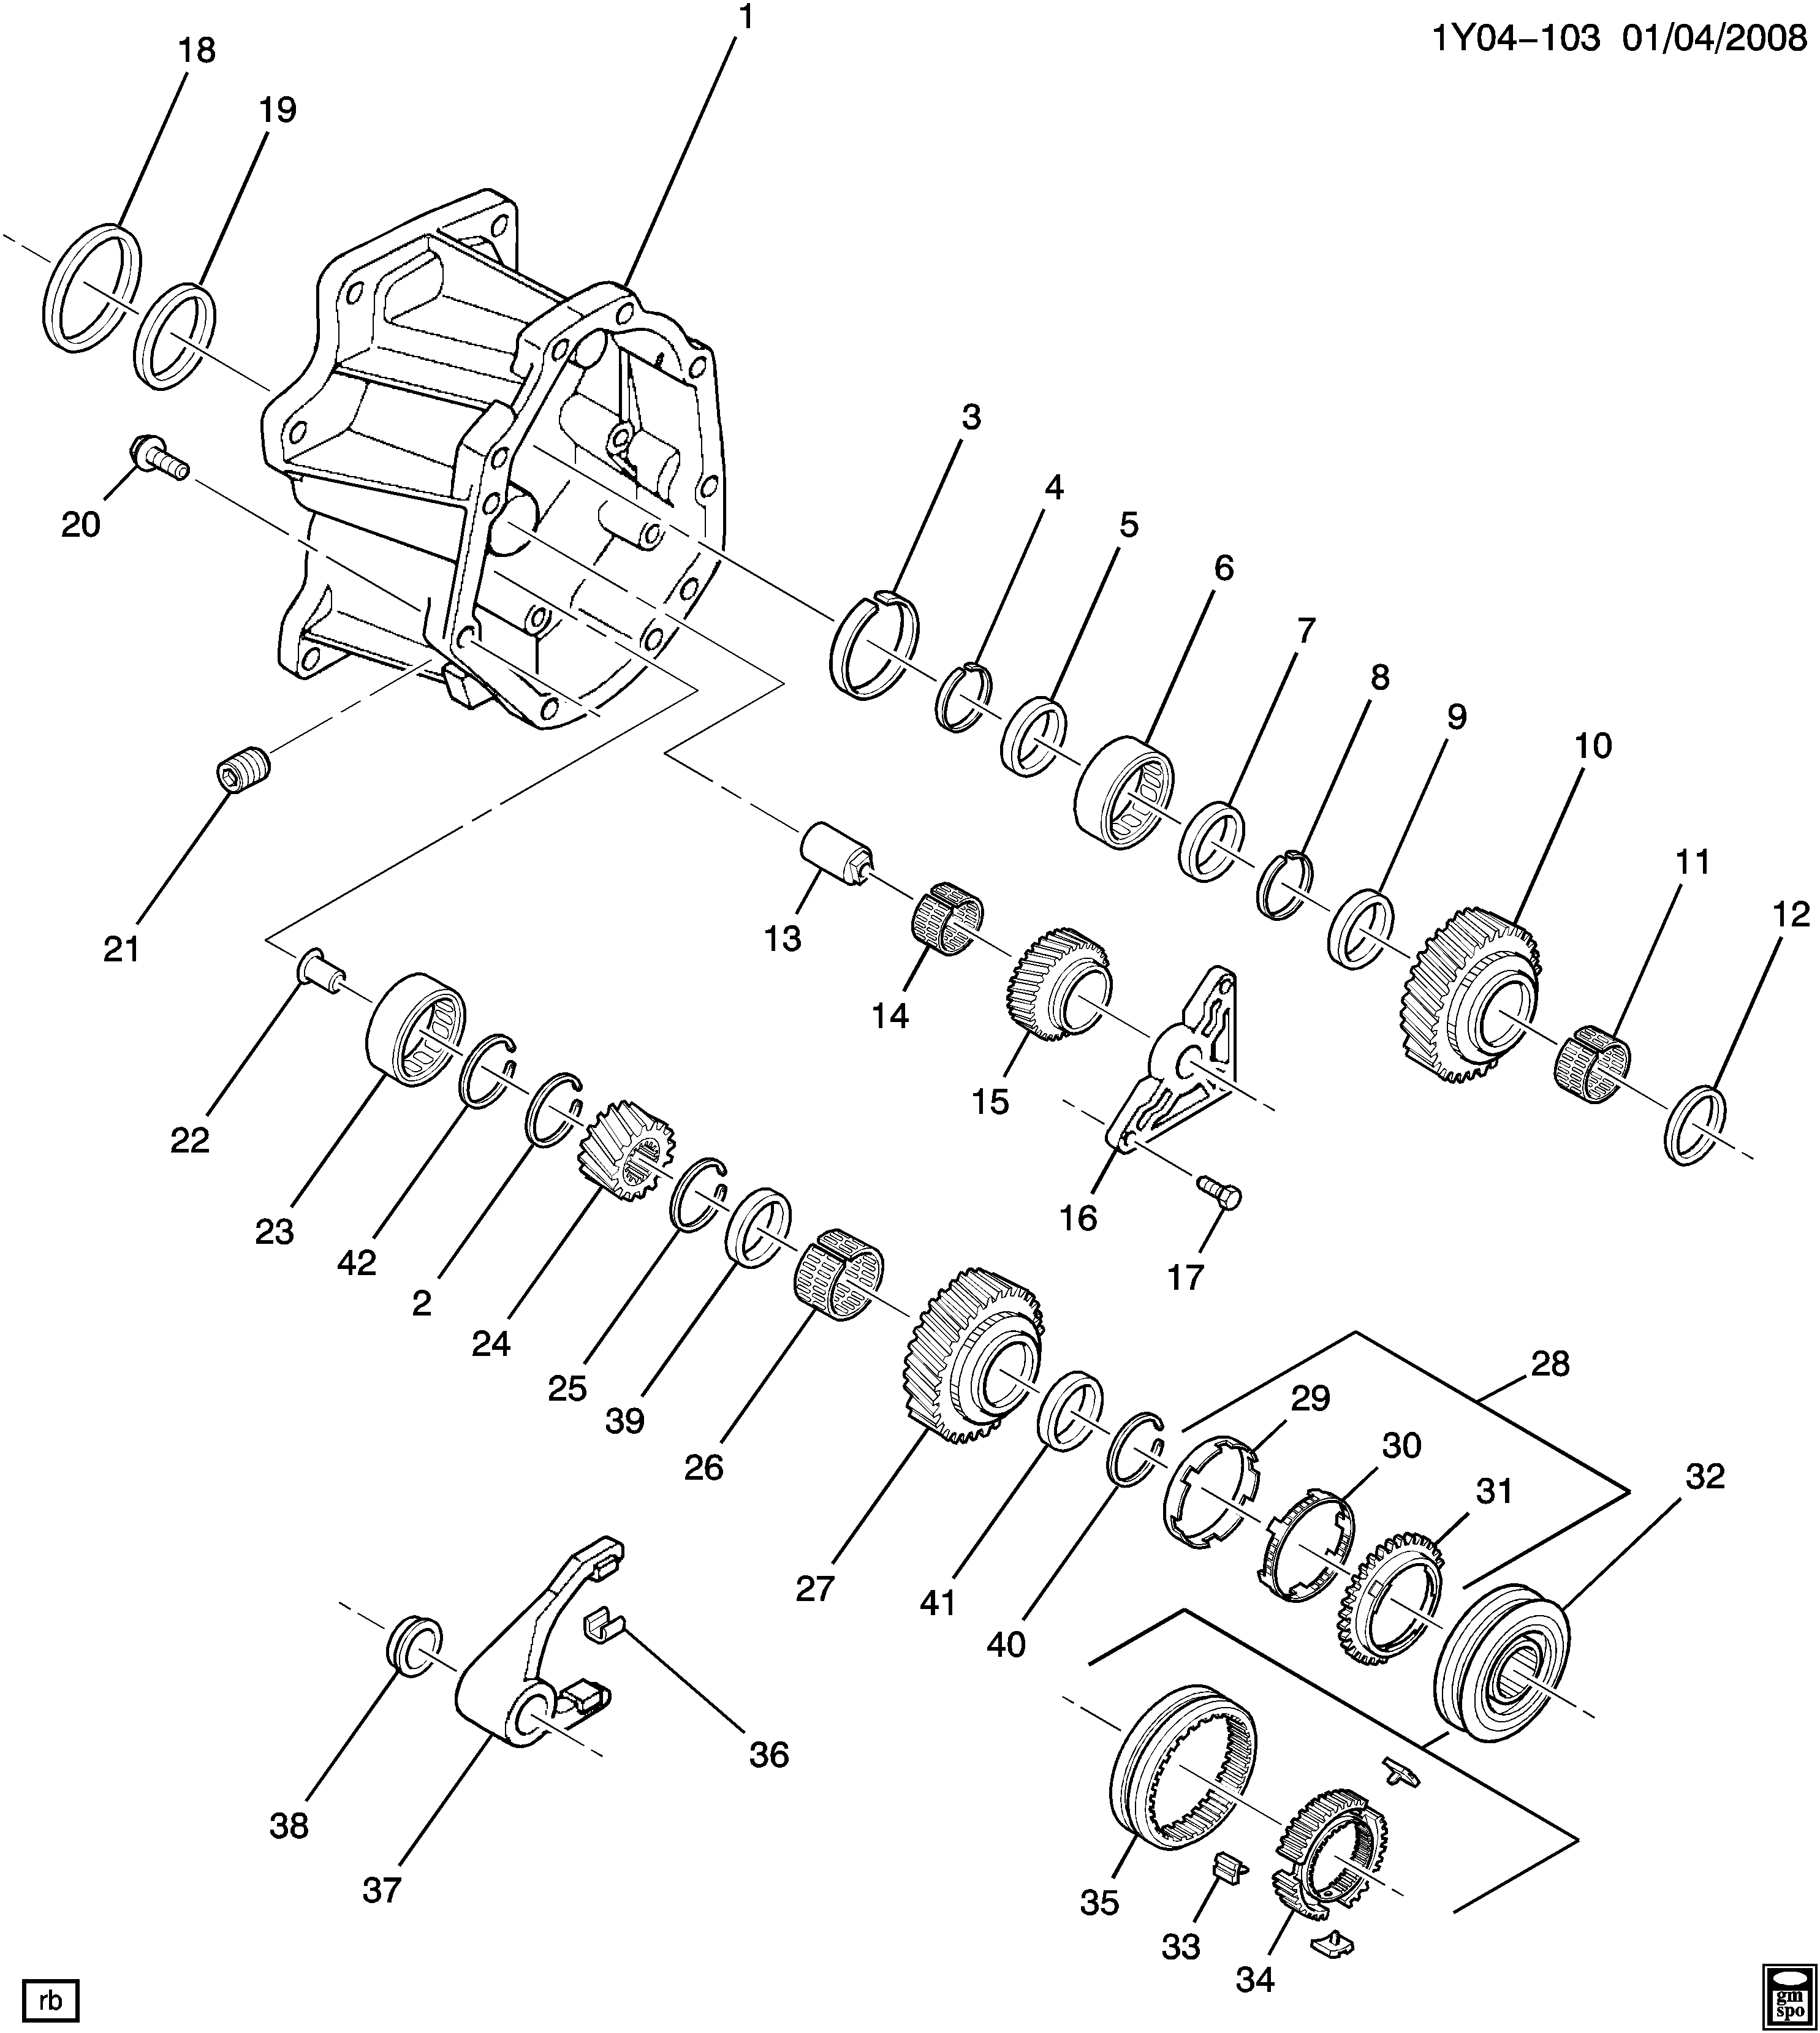 GM Genuine Parts 19209010 Manual Transmission Reverse Gear Manual ...